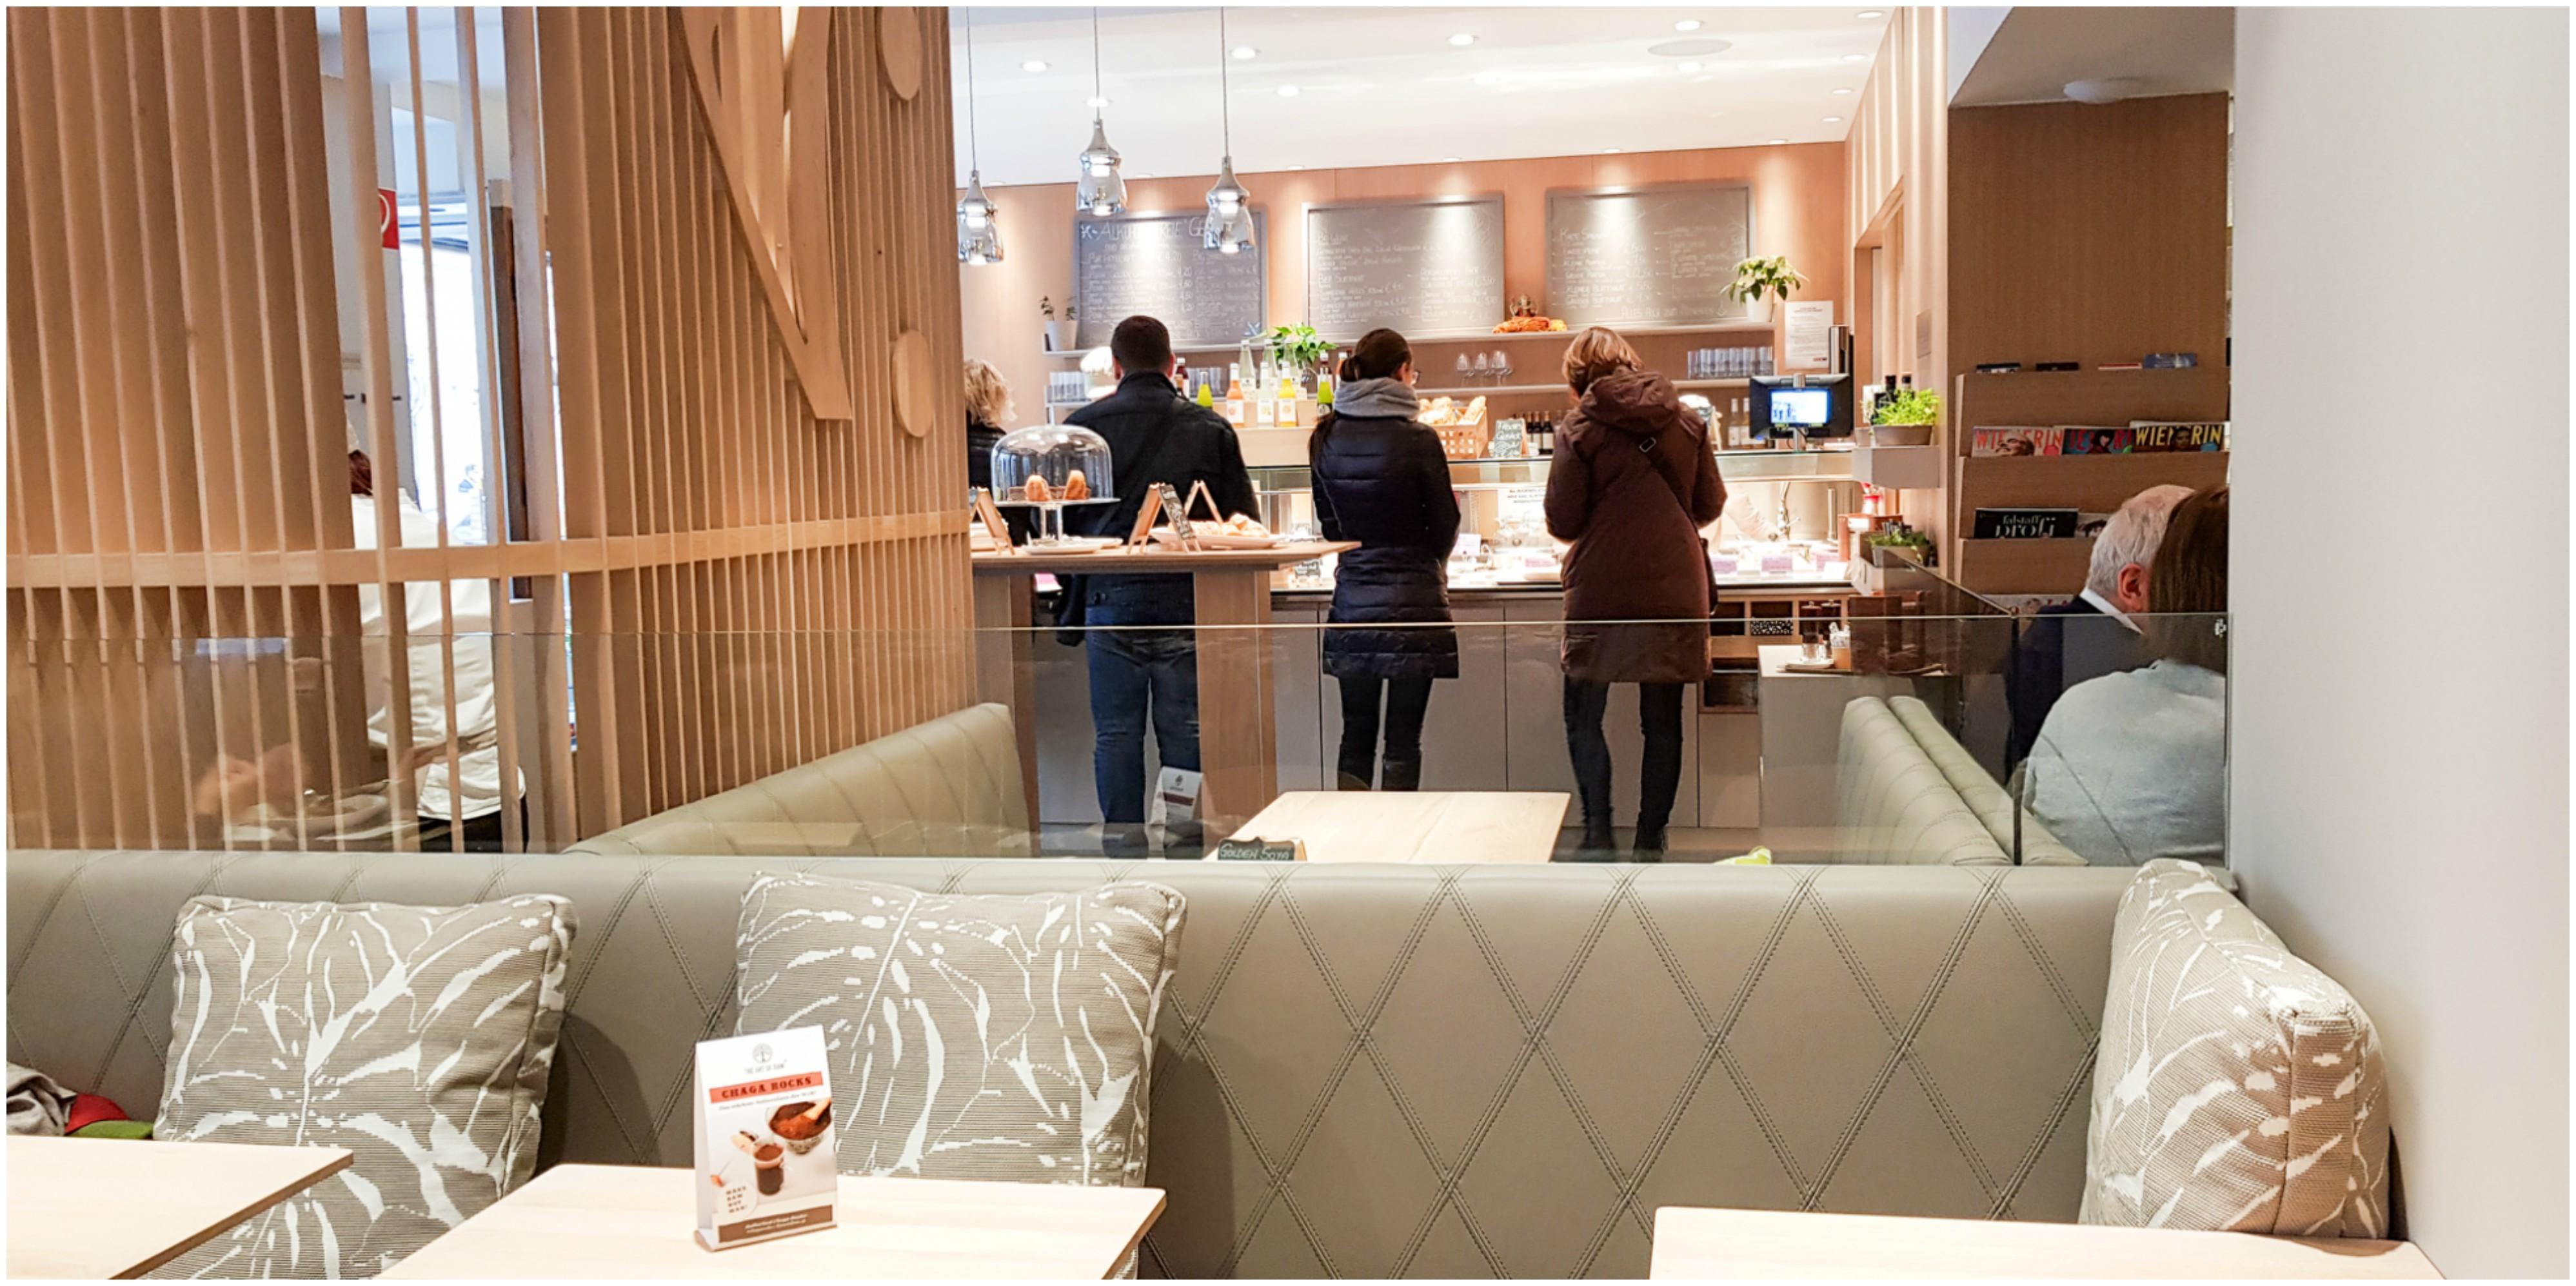 venuss-vegan-restaurant-wien-hofburg